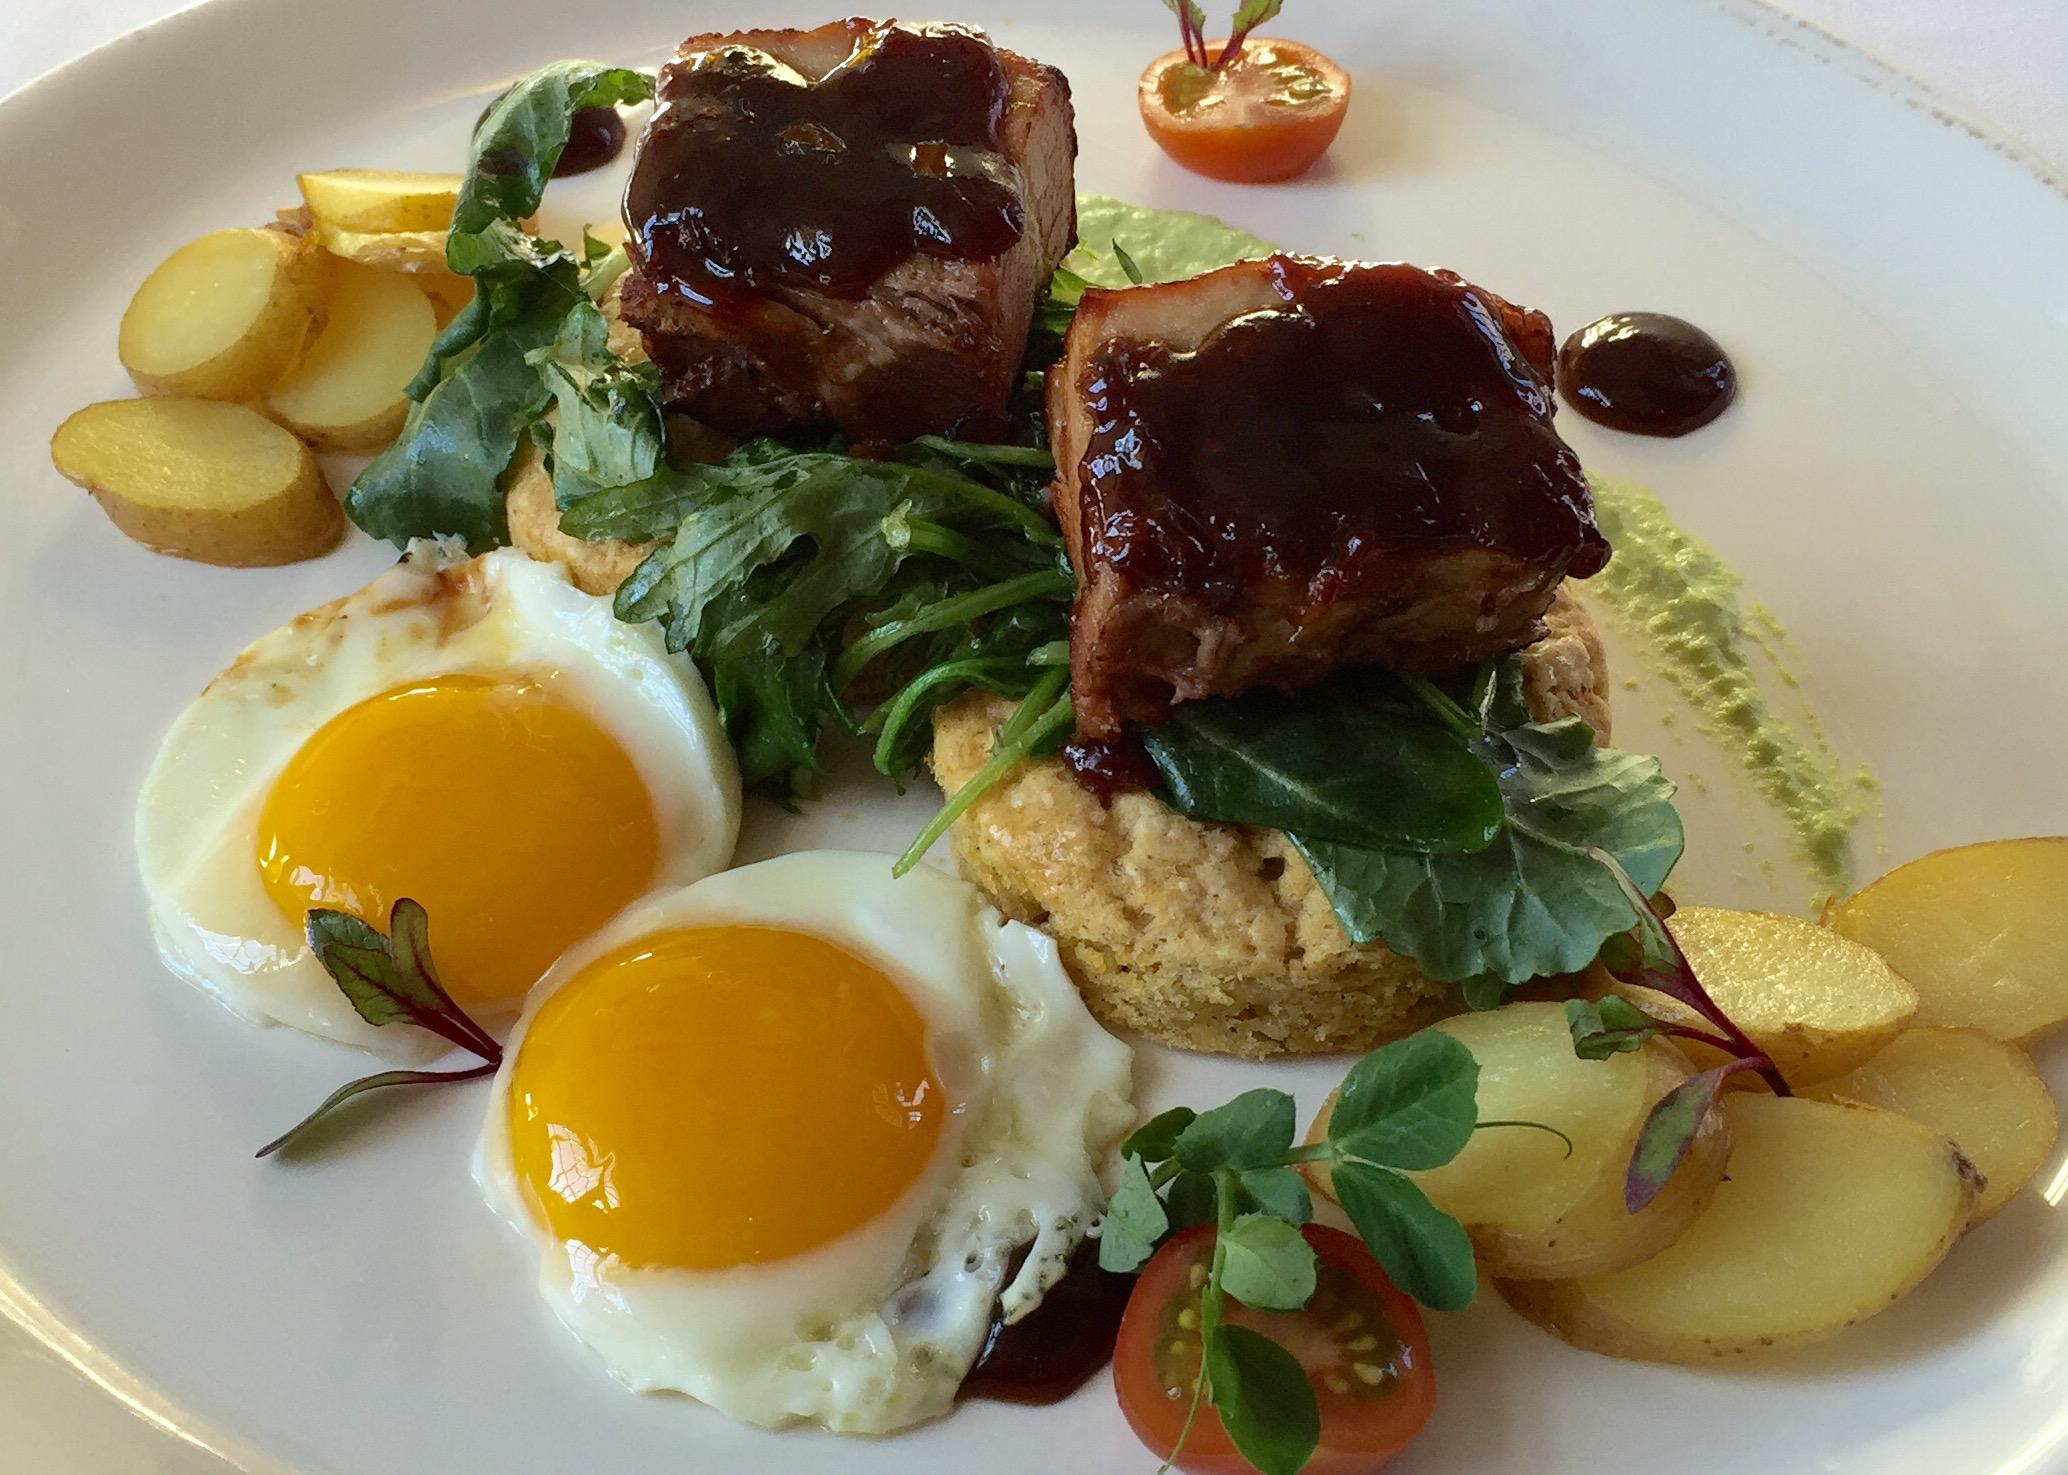 Edenton, NC Hotel breakfast - eggs benedict